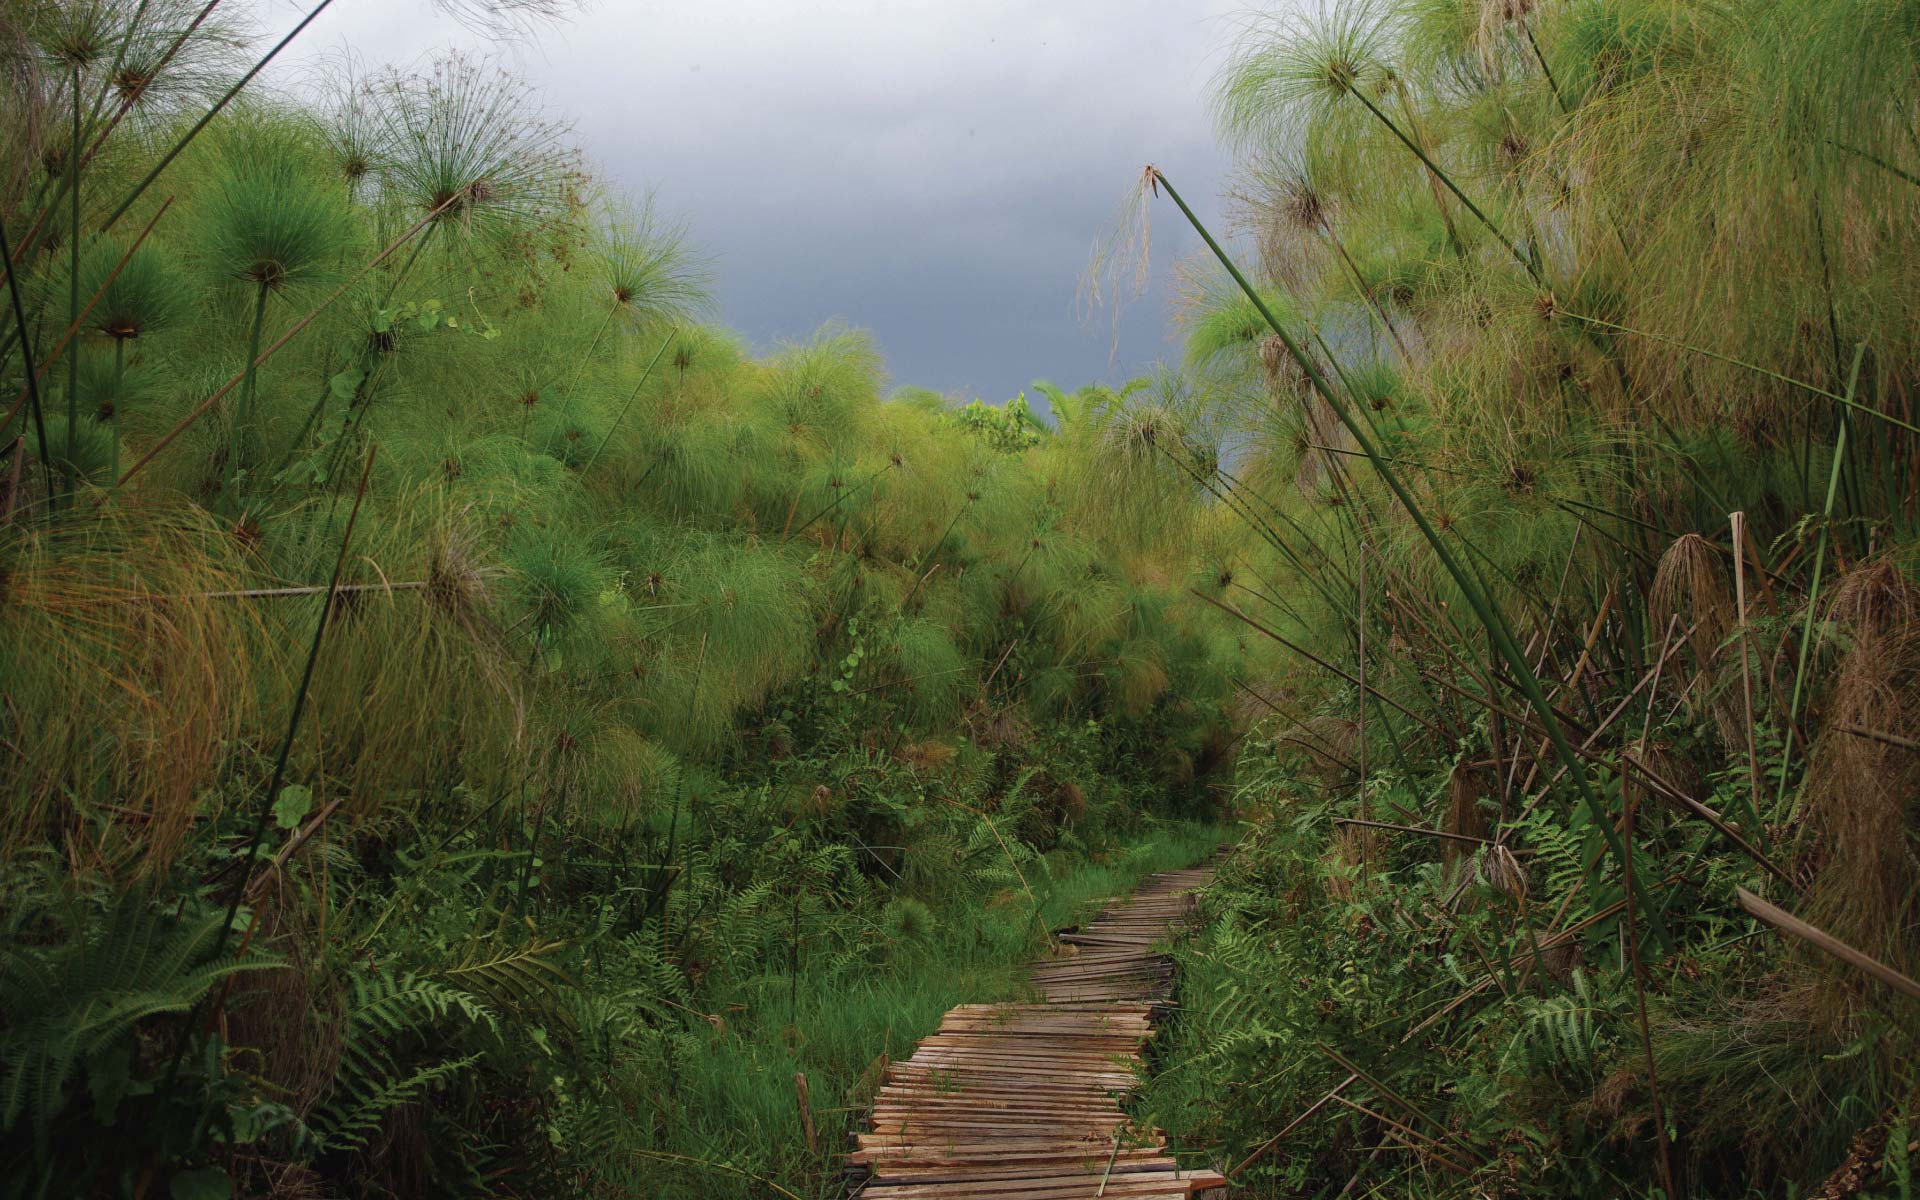 BIGODI WETLAND SANCTUARY, Uganda